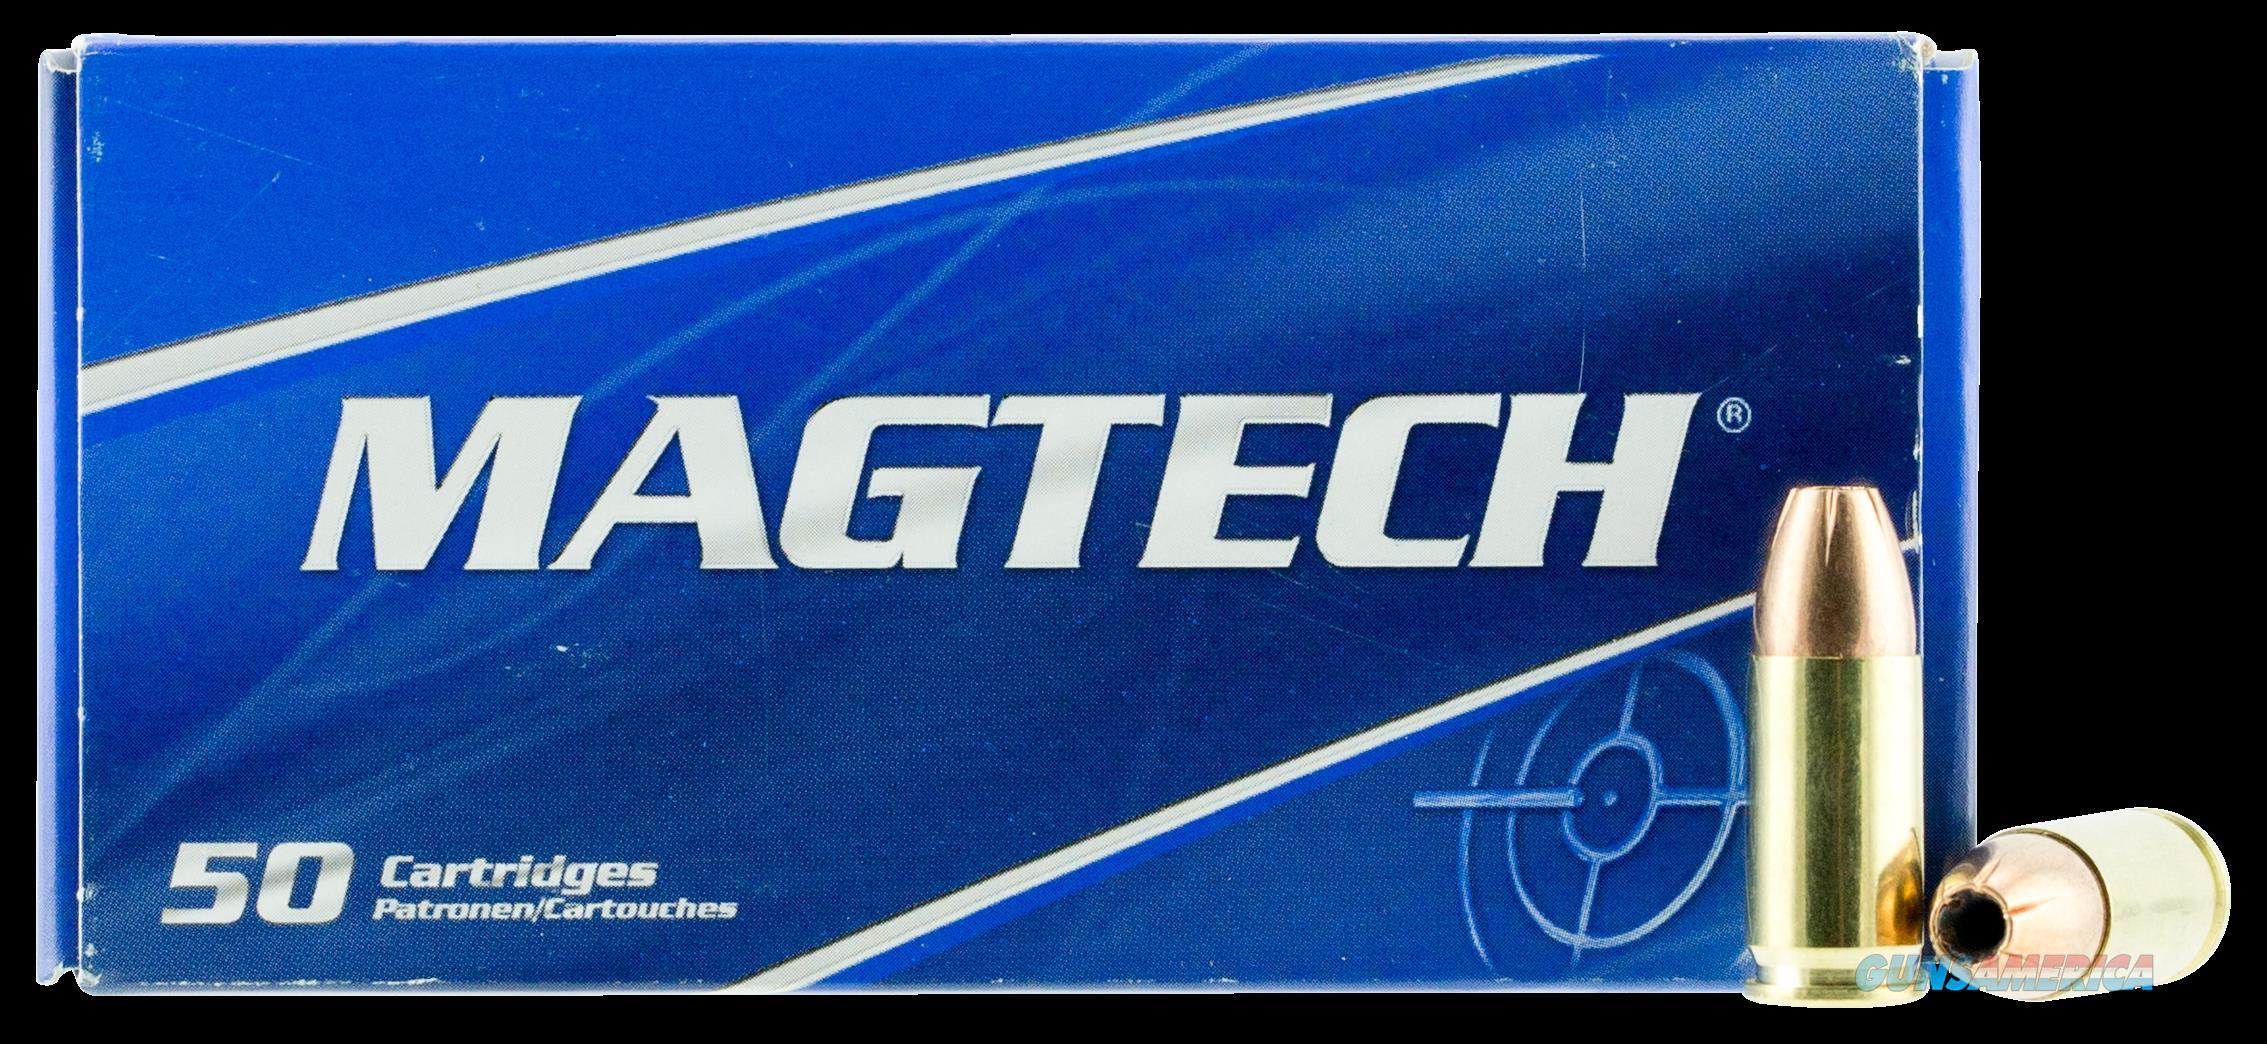 Magtech Range-training, Magtech 500d   500sw  325 Fmj    20-25  Guns > Pistols > 1911 Pistol Copies (non-Colt)